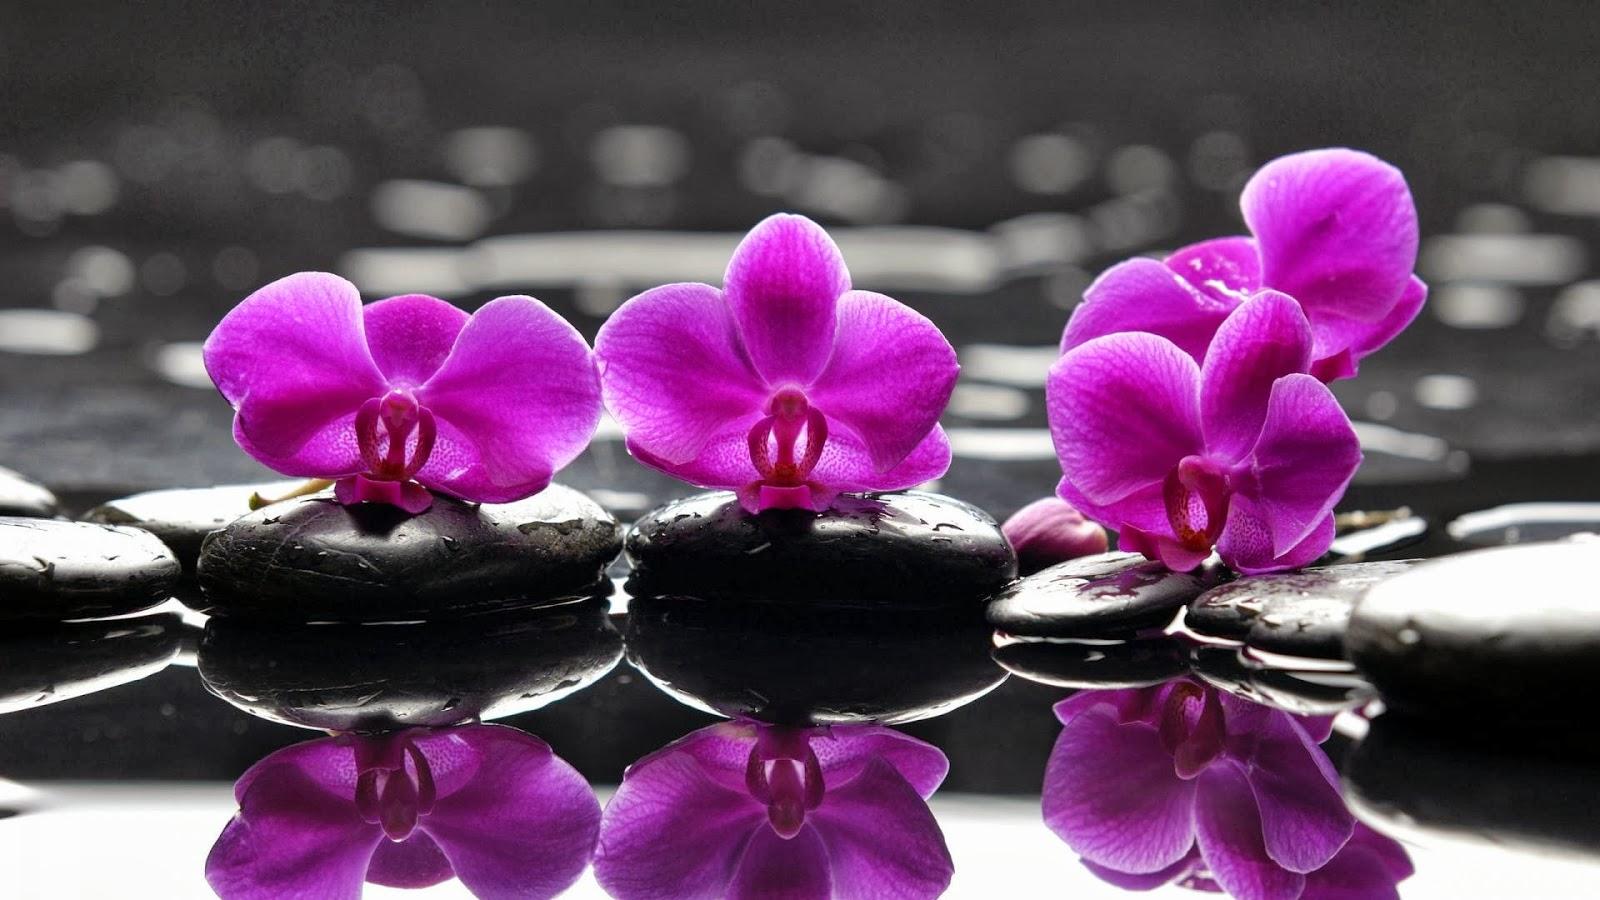 Fondo de pantalla flores violetas